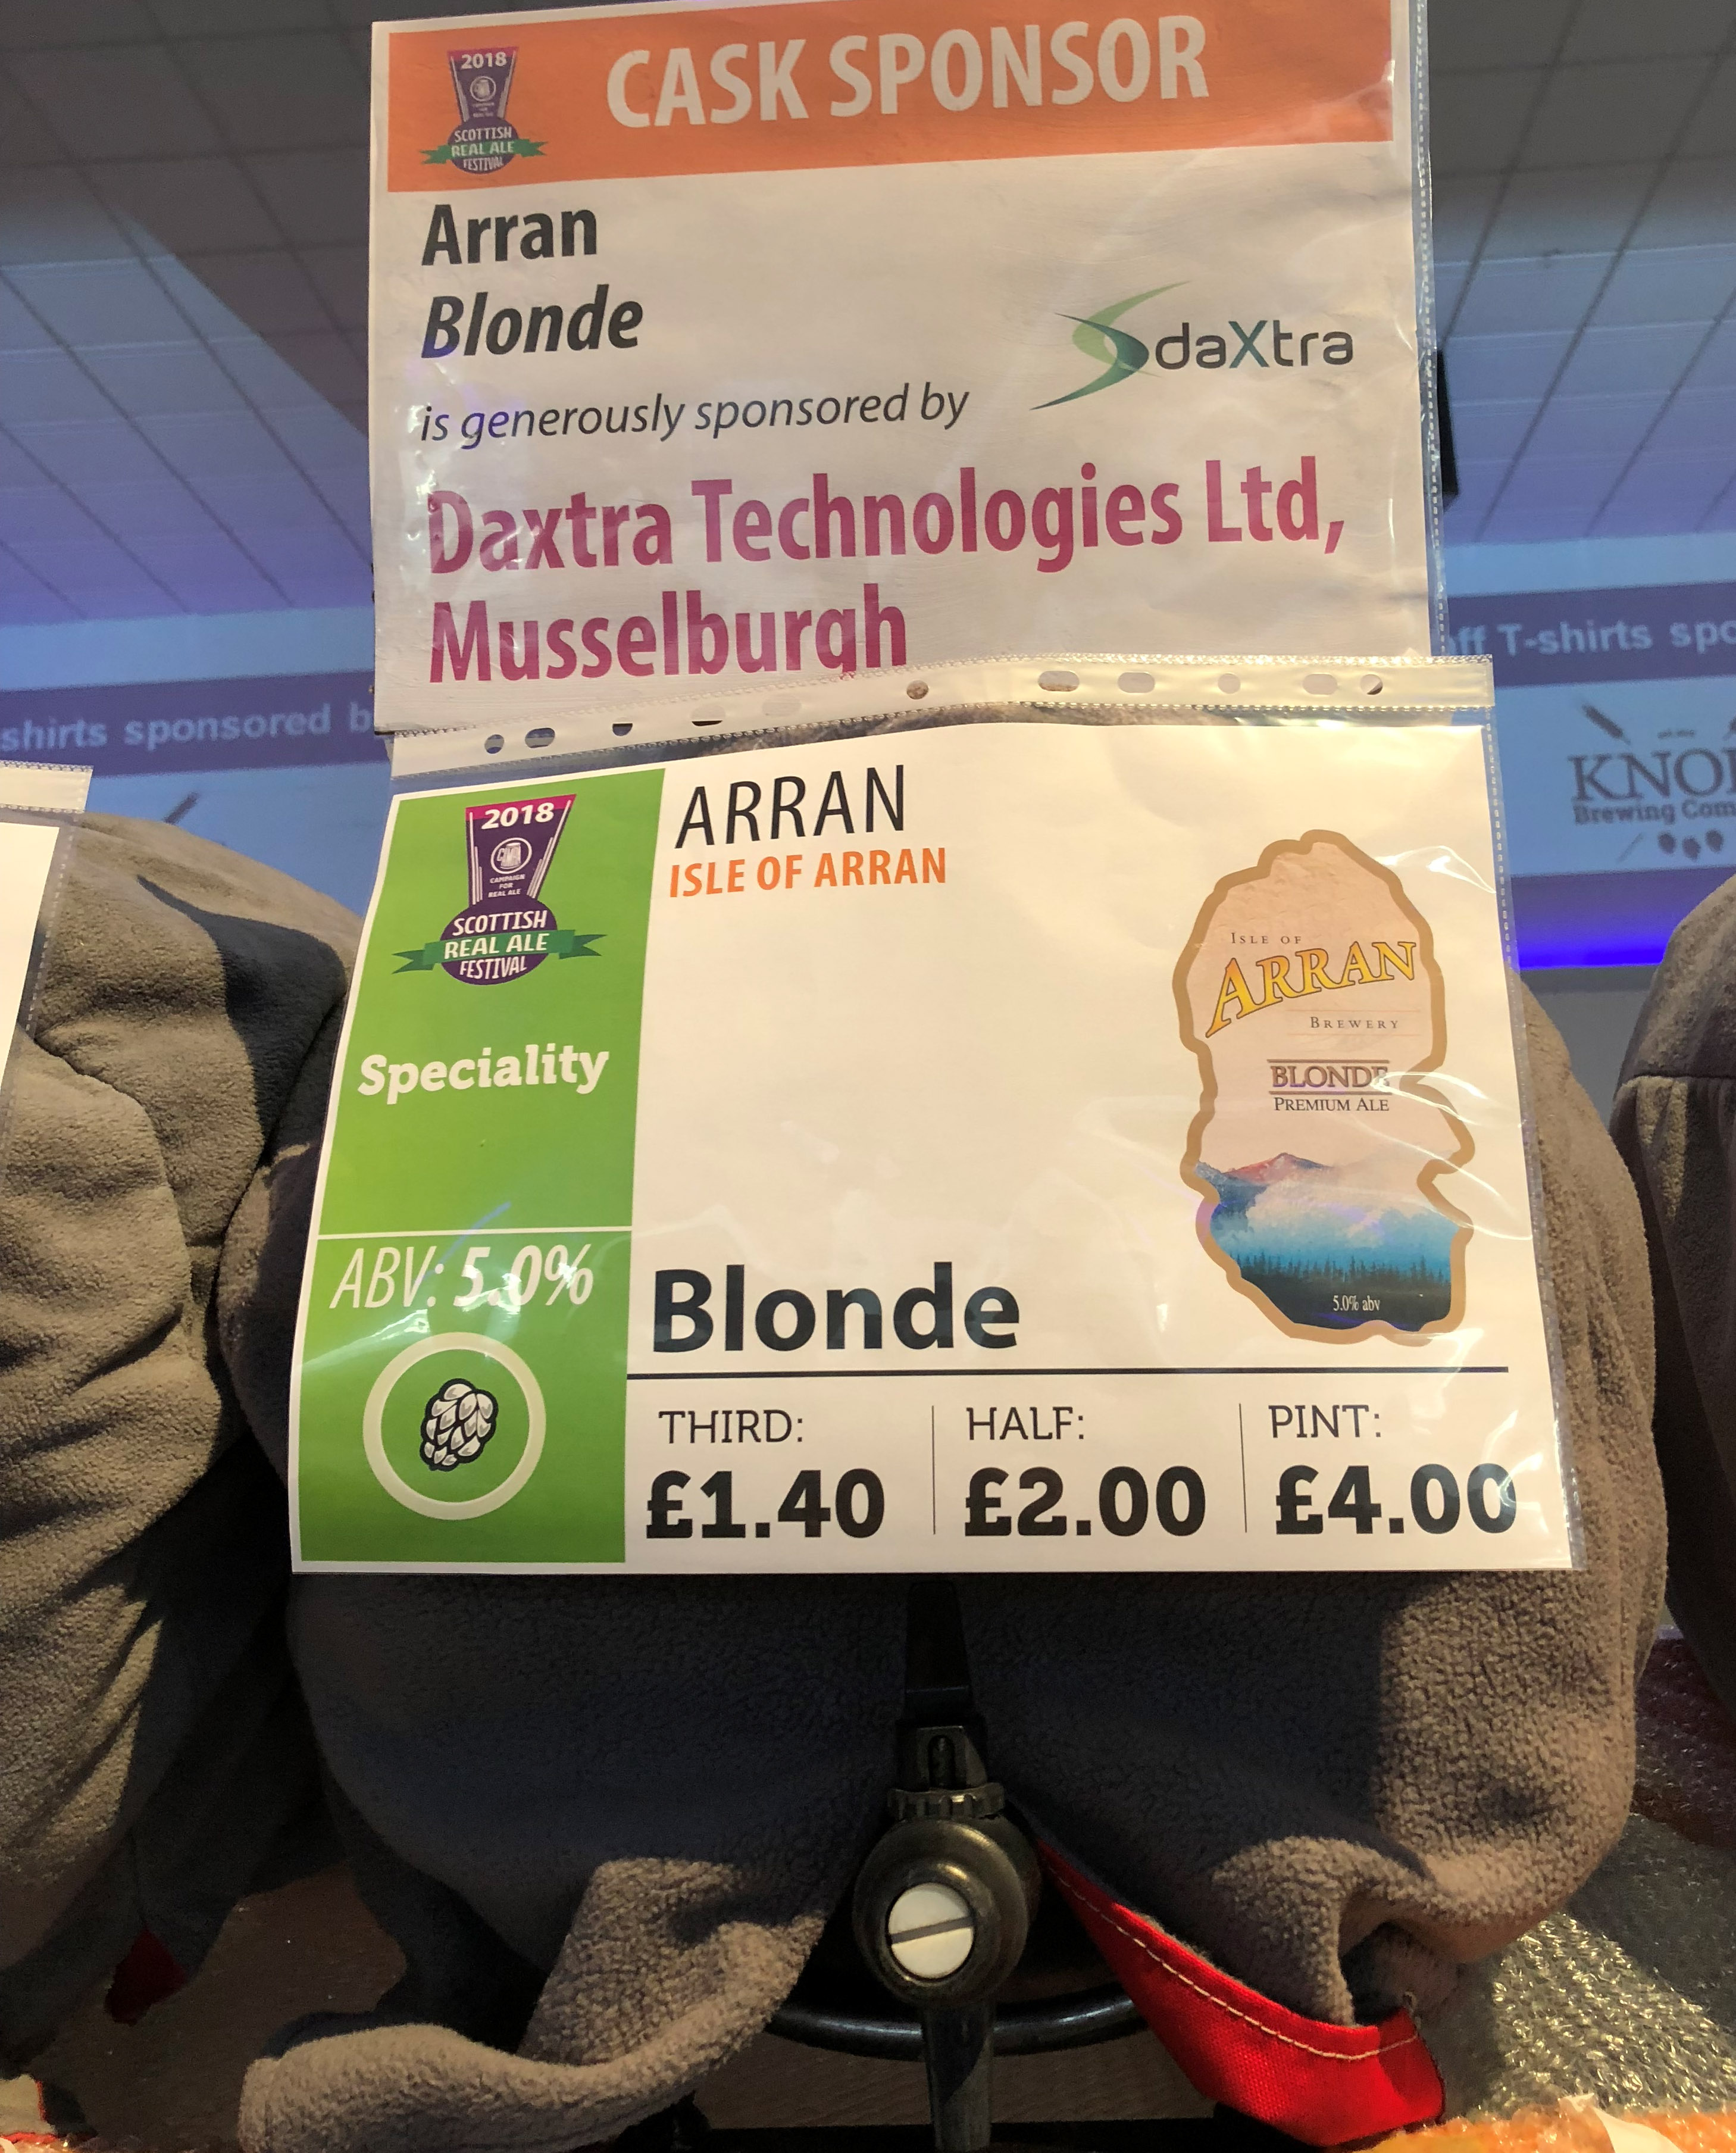 DaXtra sponsors cask of Arran Blonde